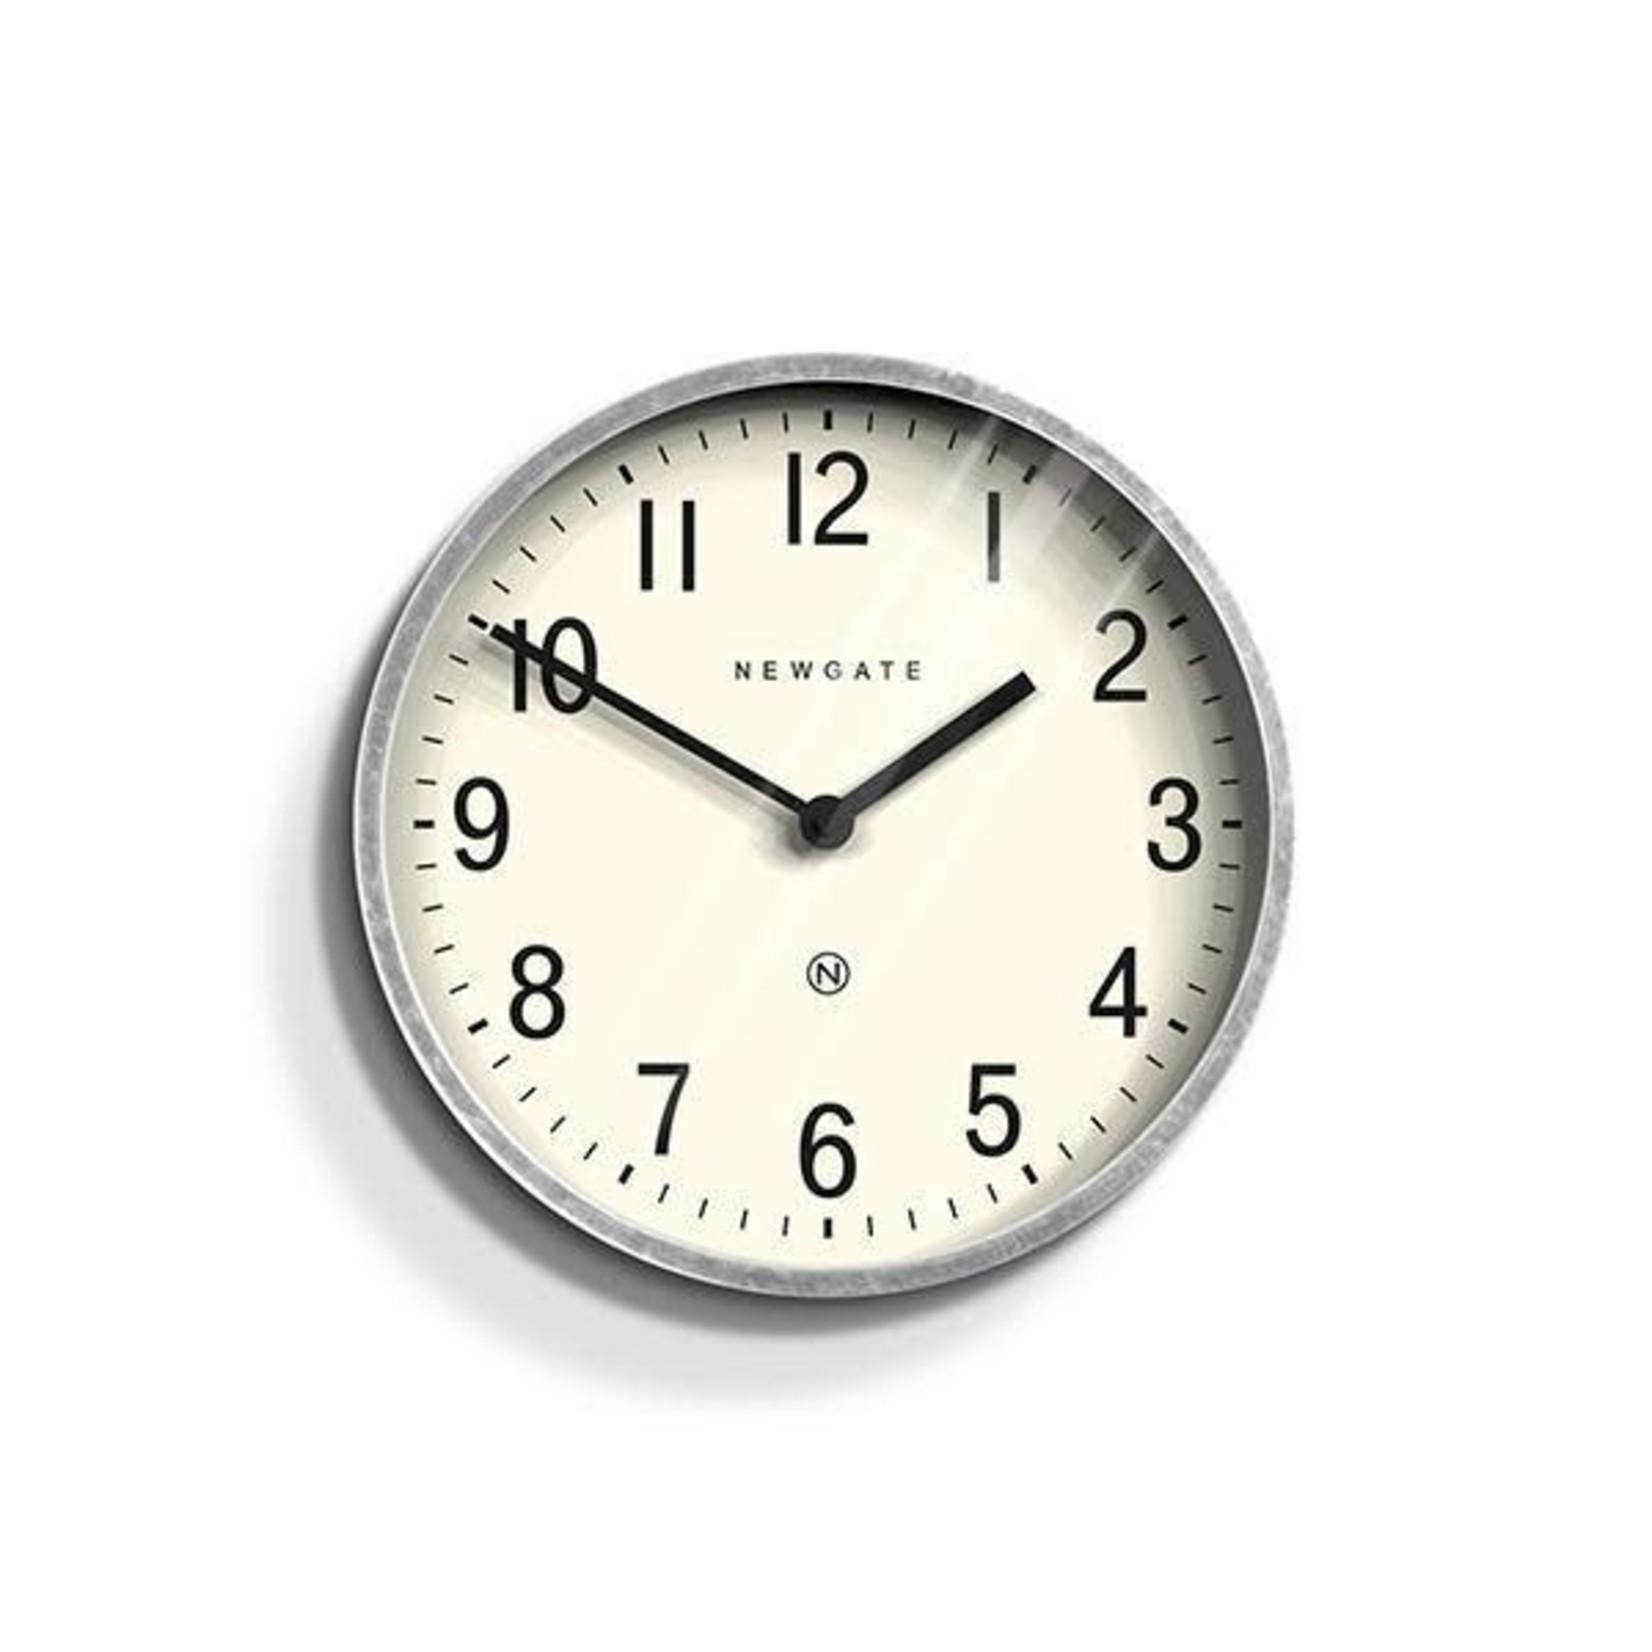 Newgate Newgate Master Edwards Clock  Galvanized Metal